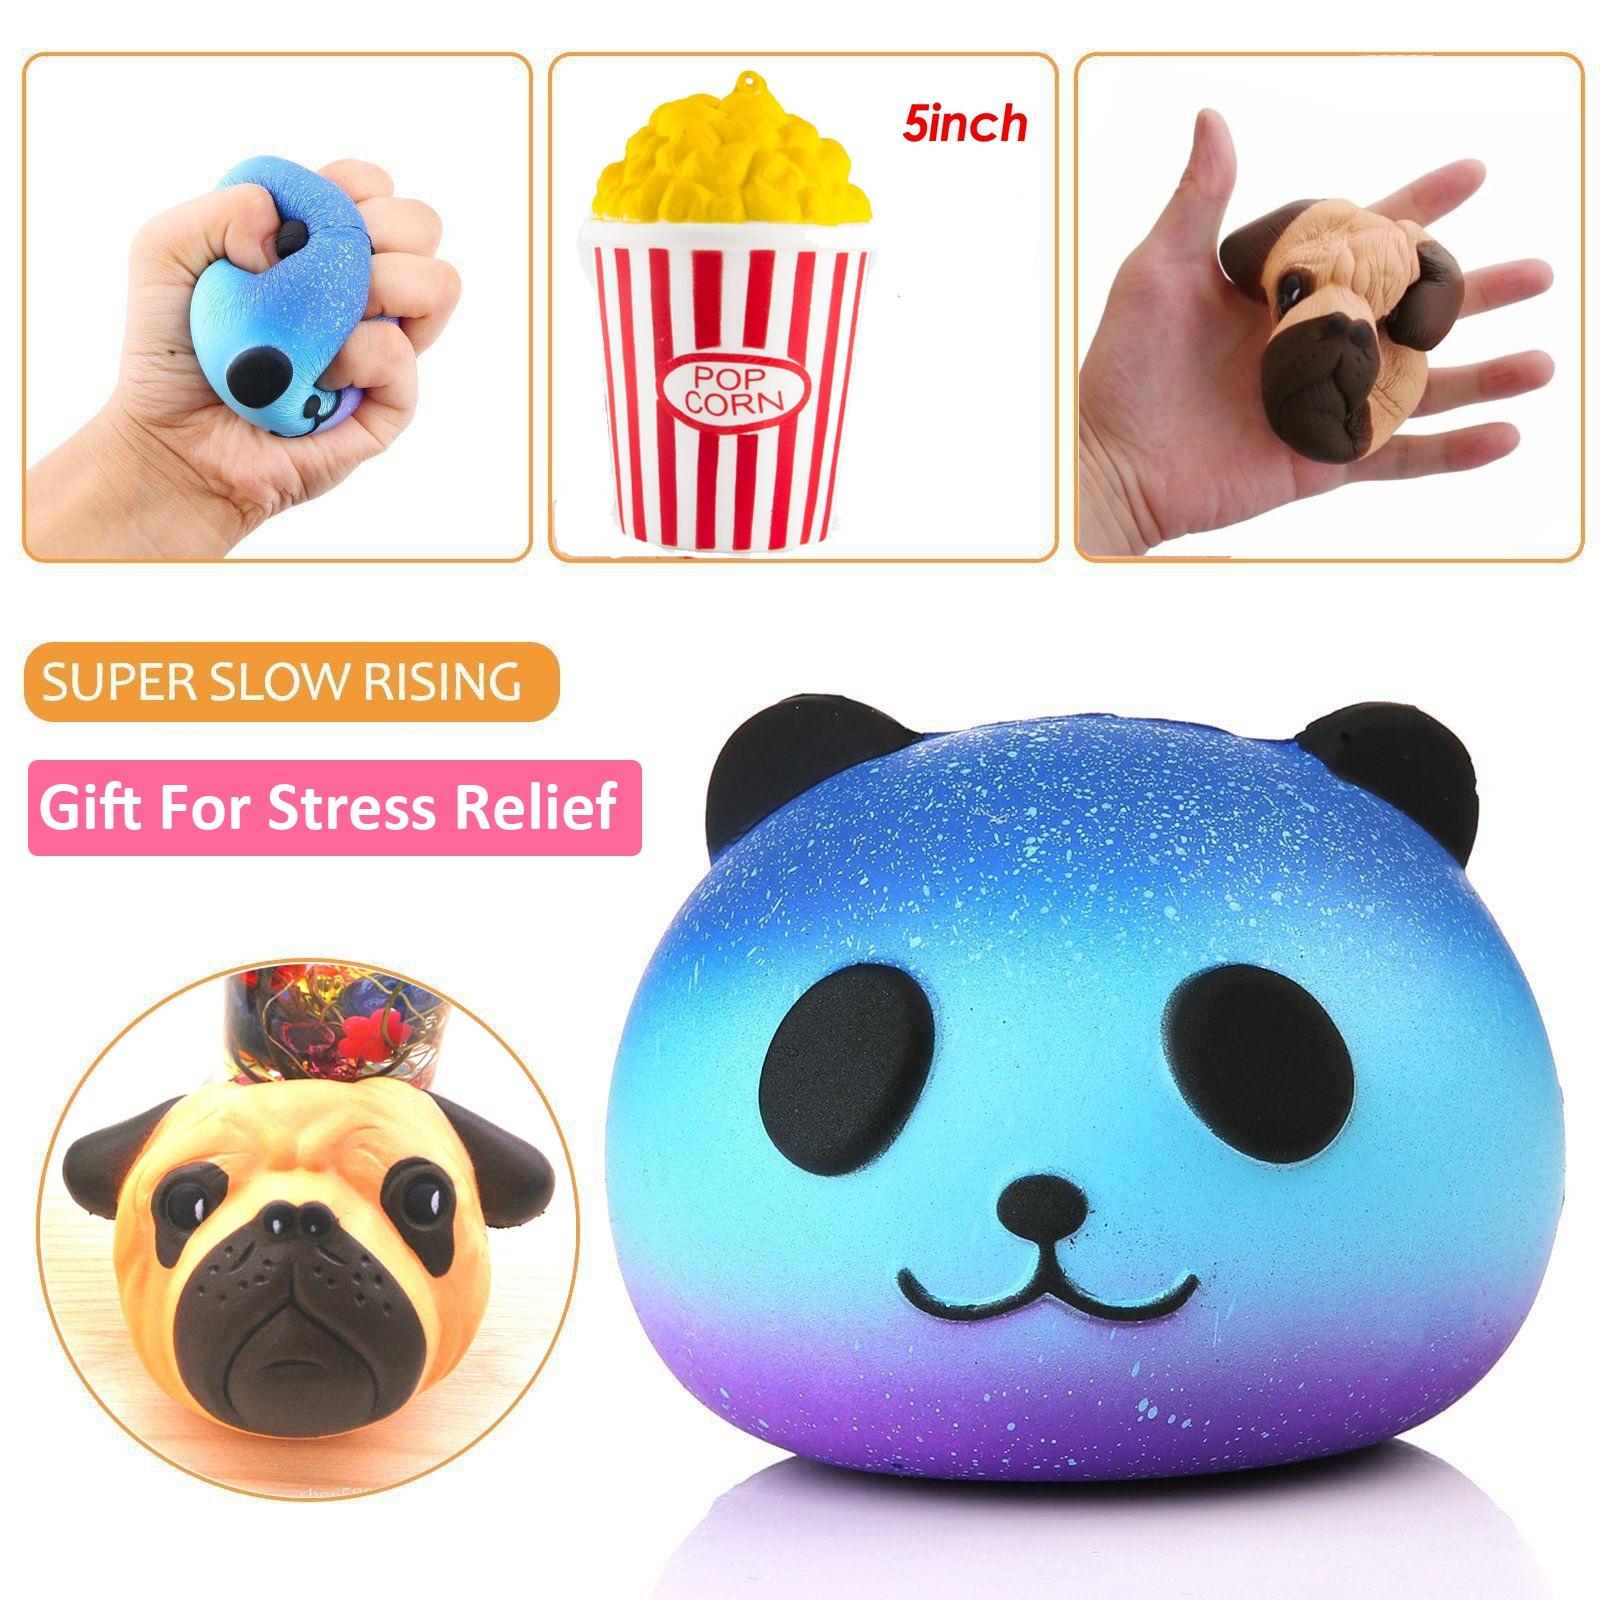 Emotion Squishy Tag : Jumbo Squishy Popcorn Kawaii Creme Duftende Langsam Steigende Kid Spielzeug eBay